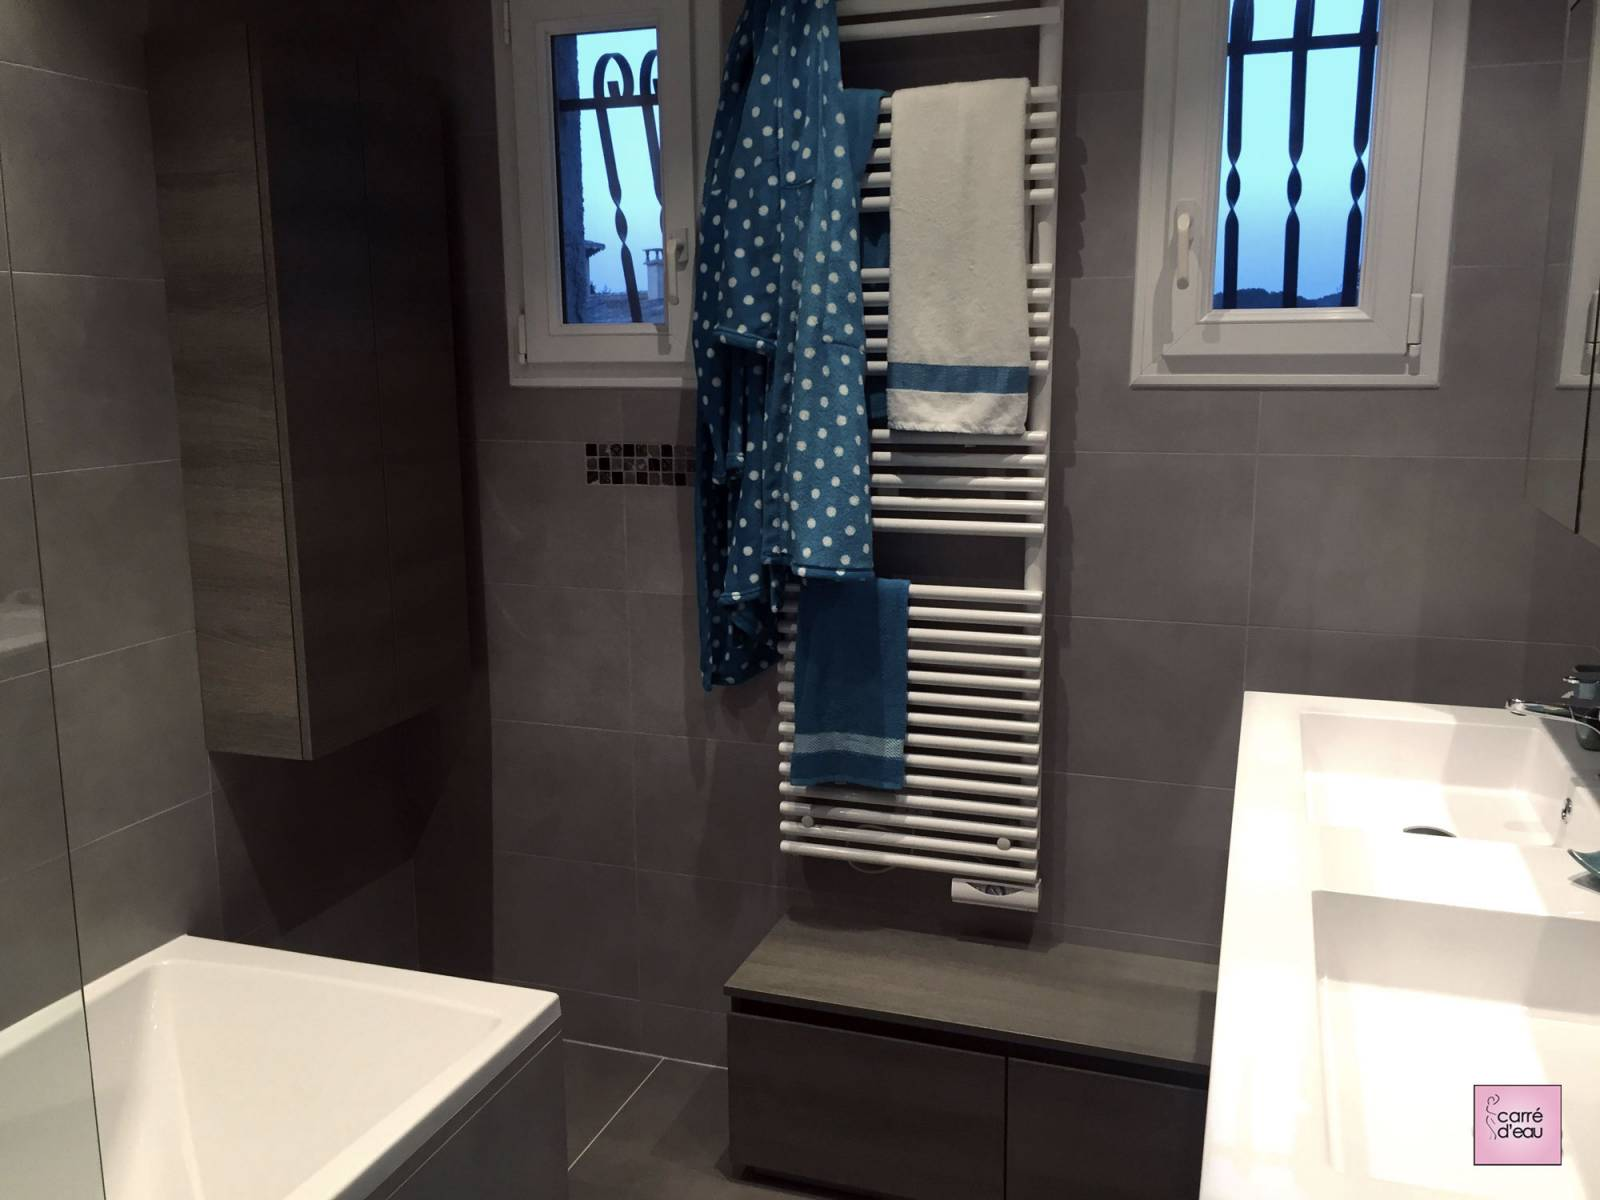 Salle De Bain Optimisee ~ salle de bain optimis e grabels carr d eau